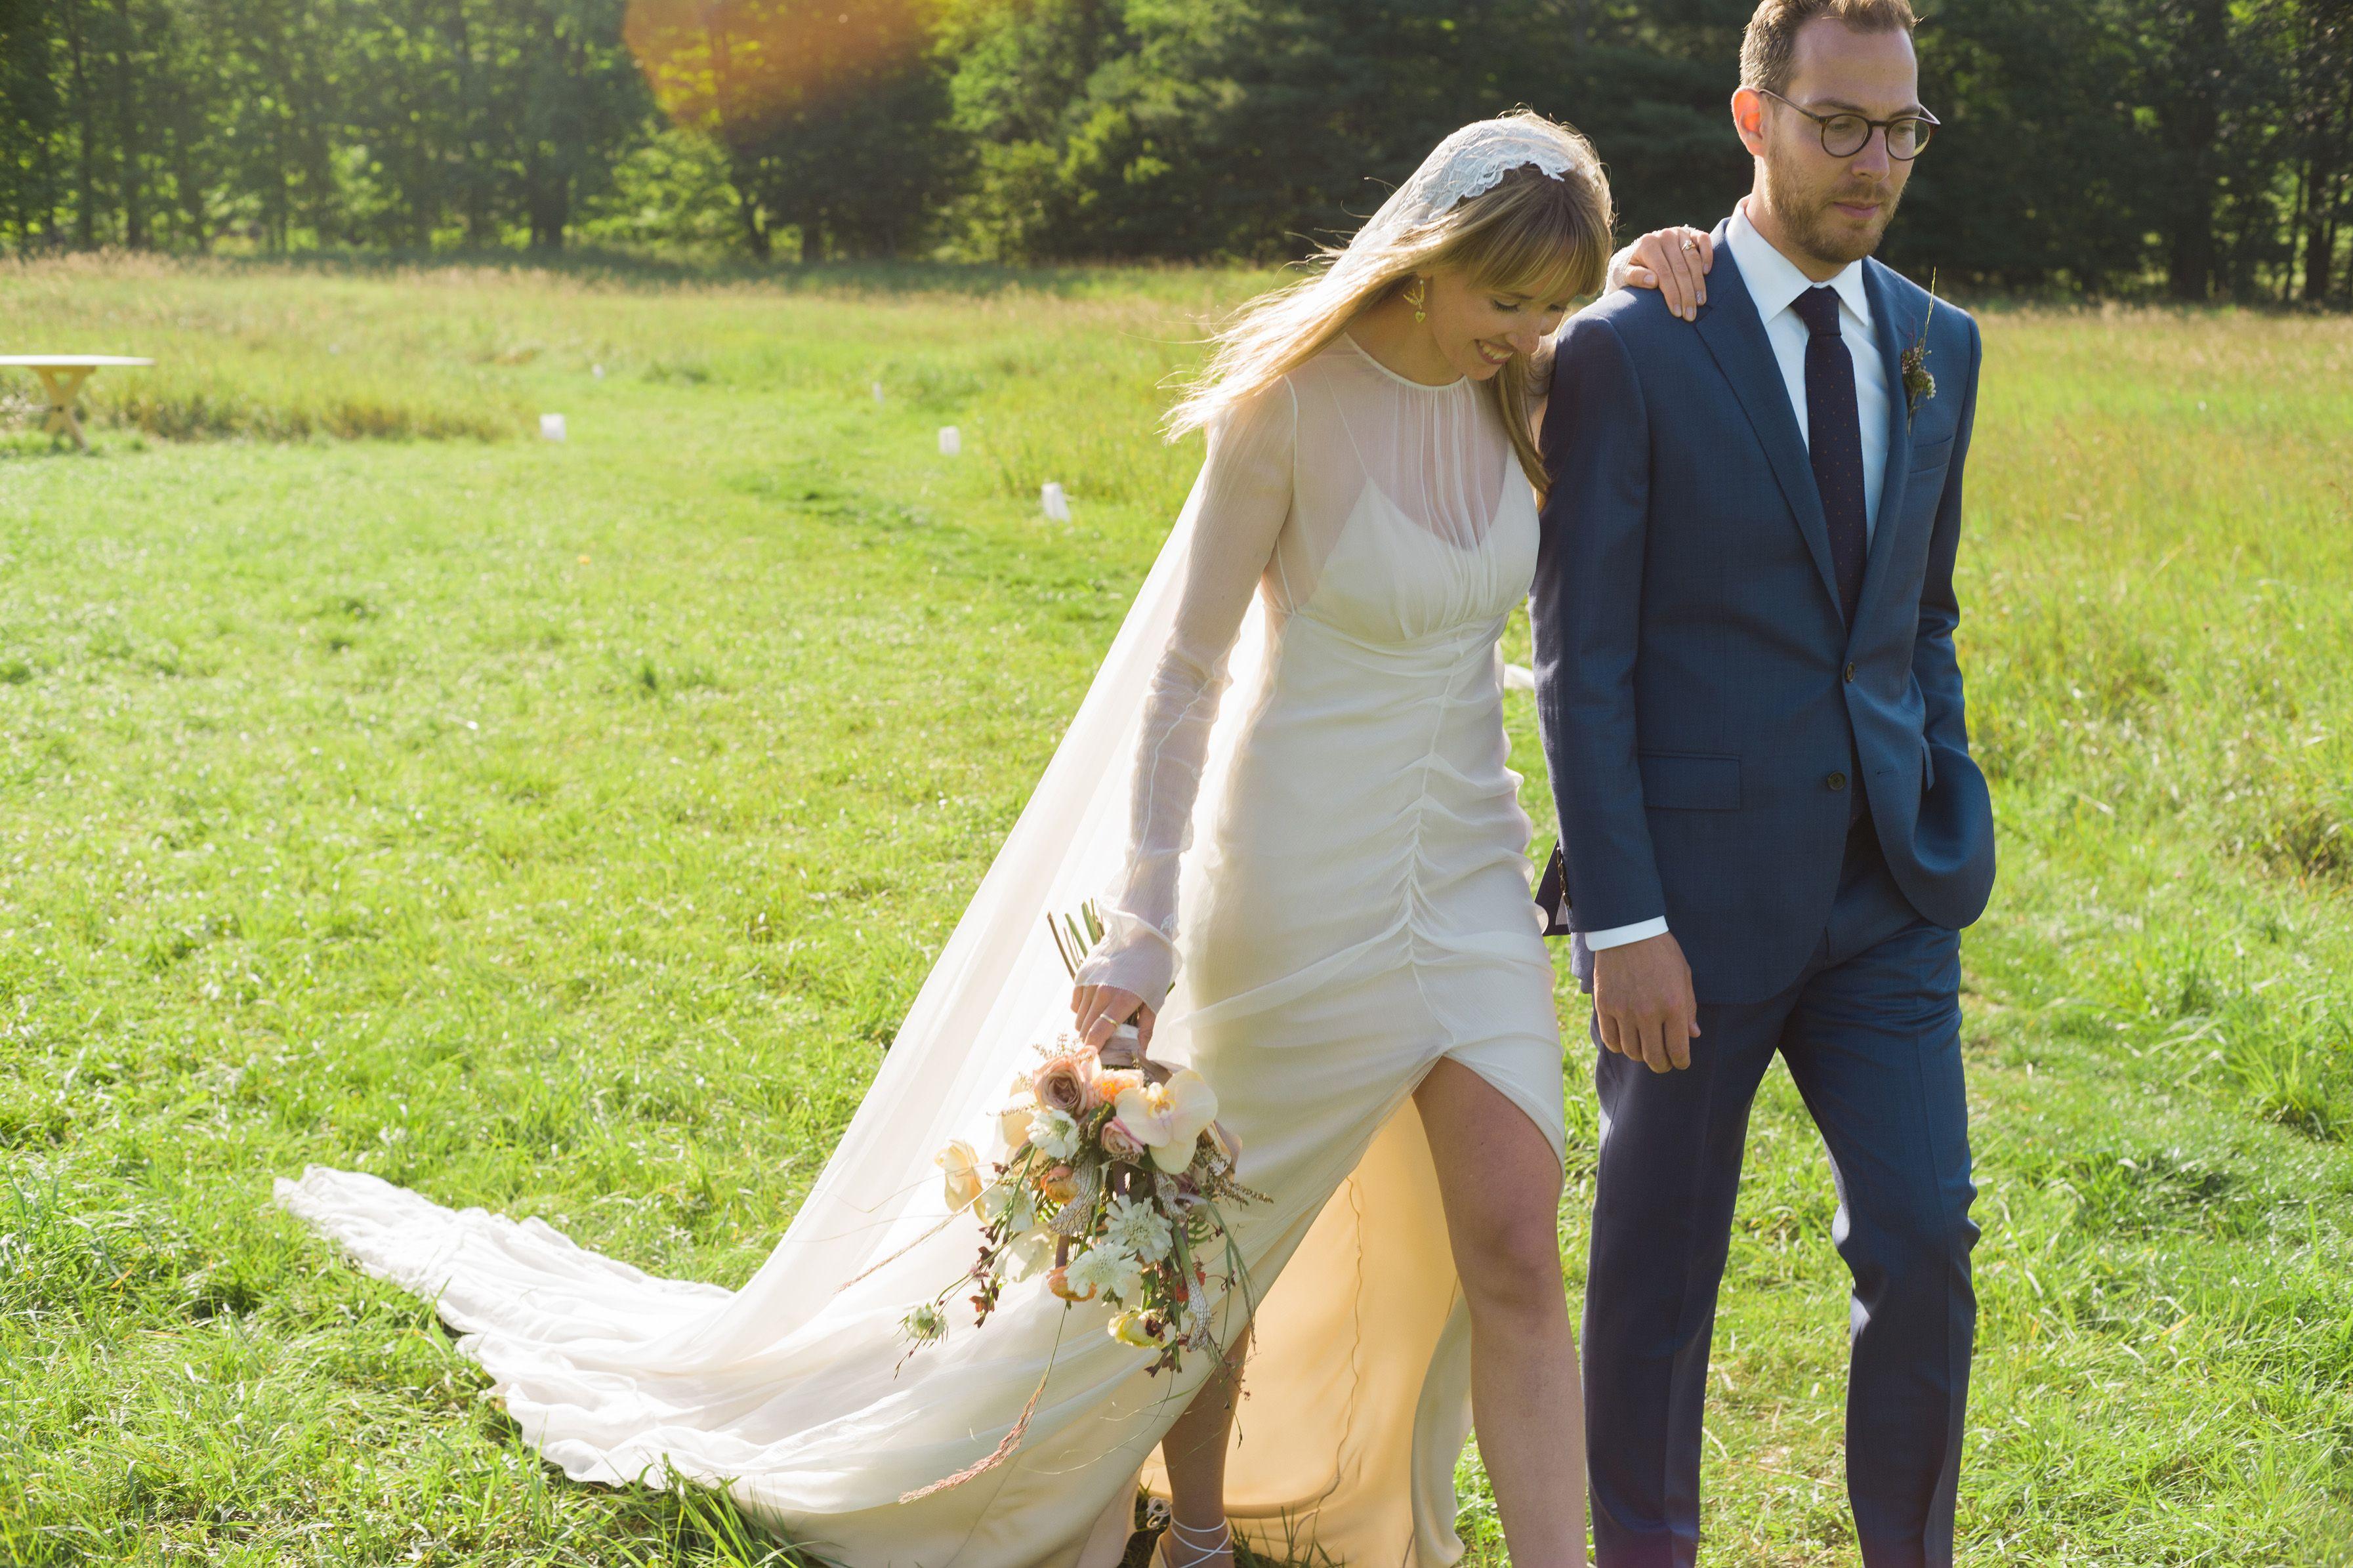 Olivia Fleming and Matt Rubin Wedding - The Ultimate Barn Wedding